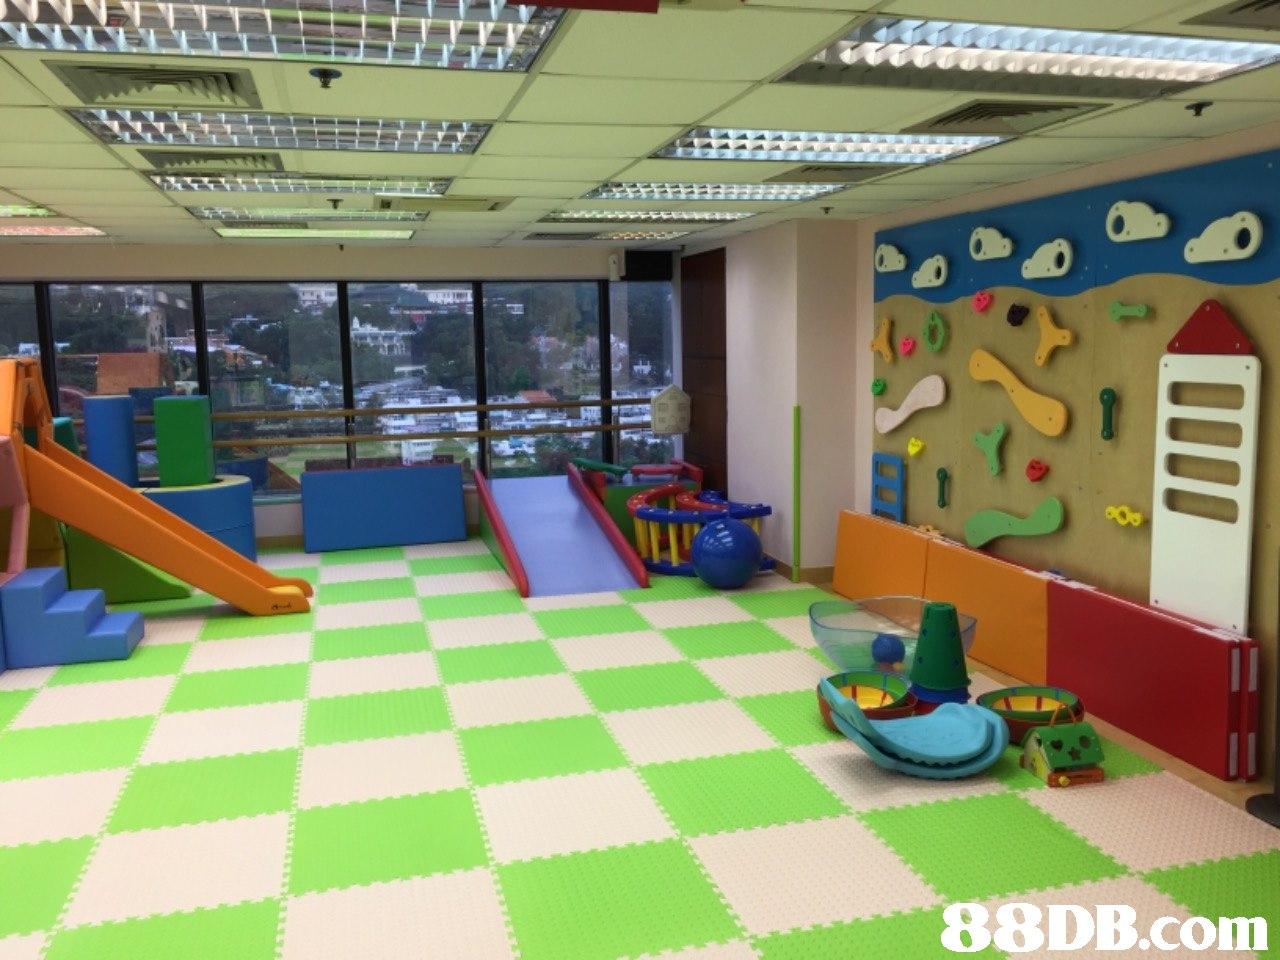 Kindergarten,Public space,Playground,Building,Human settlement